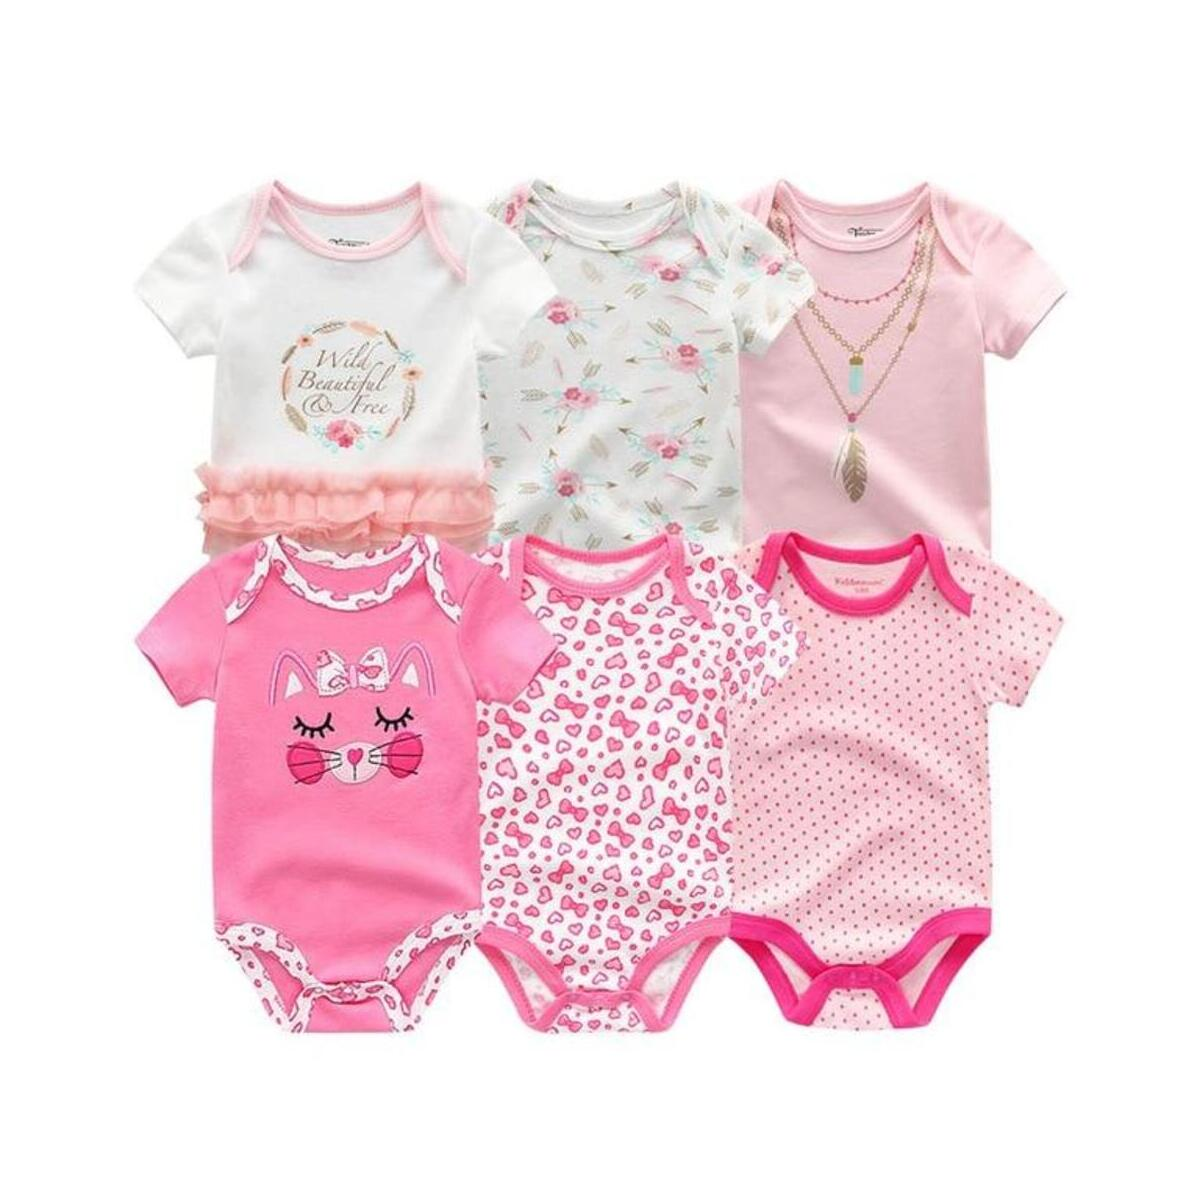 Newborn Soft Thermal Short Sleeve Bodysuits